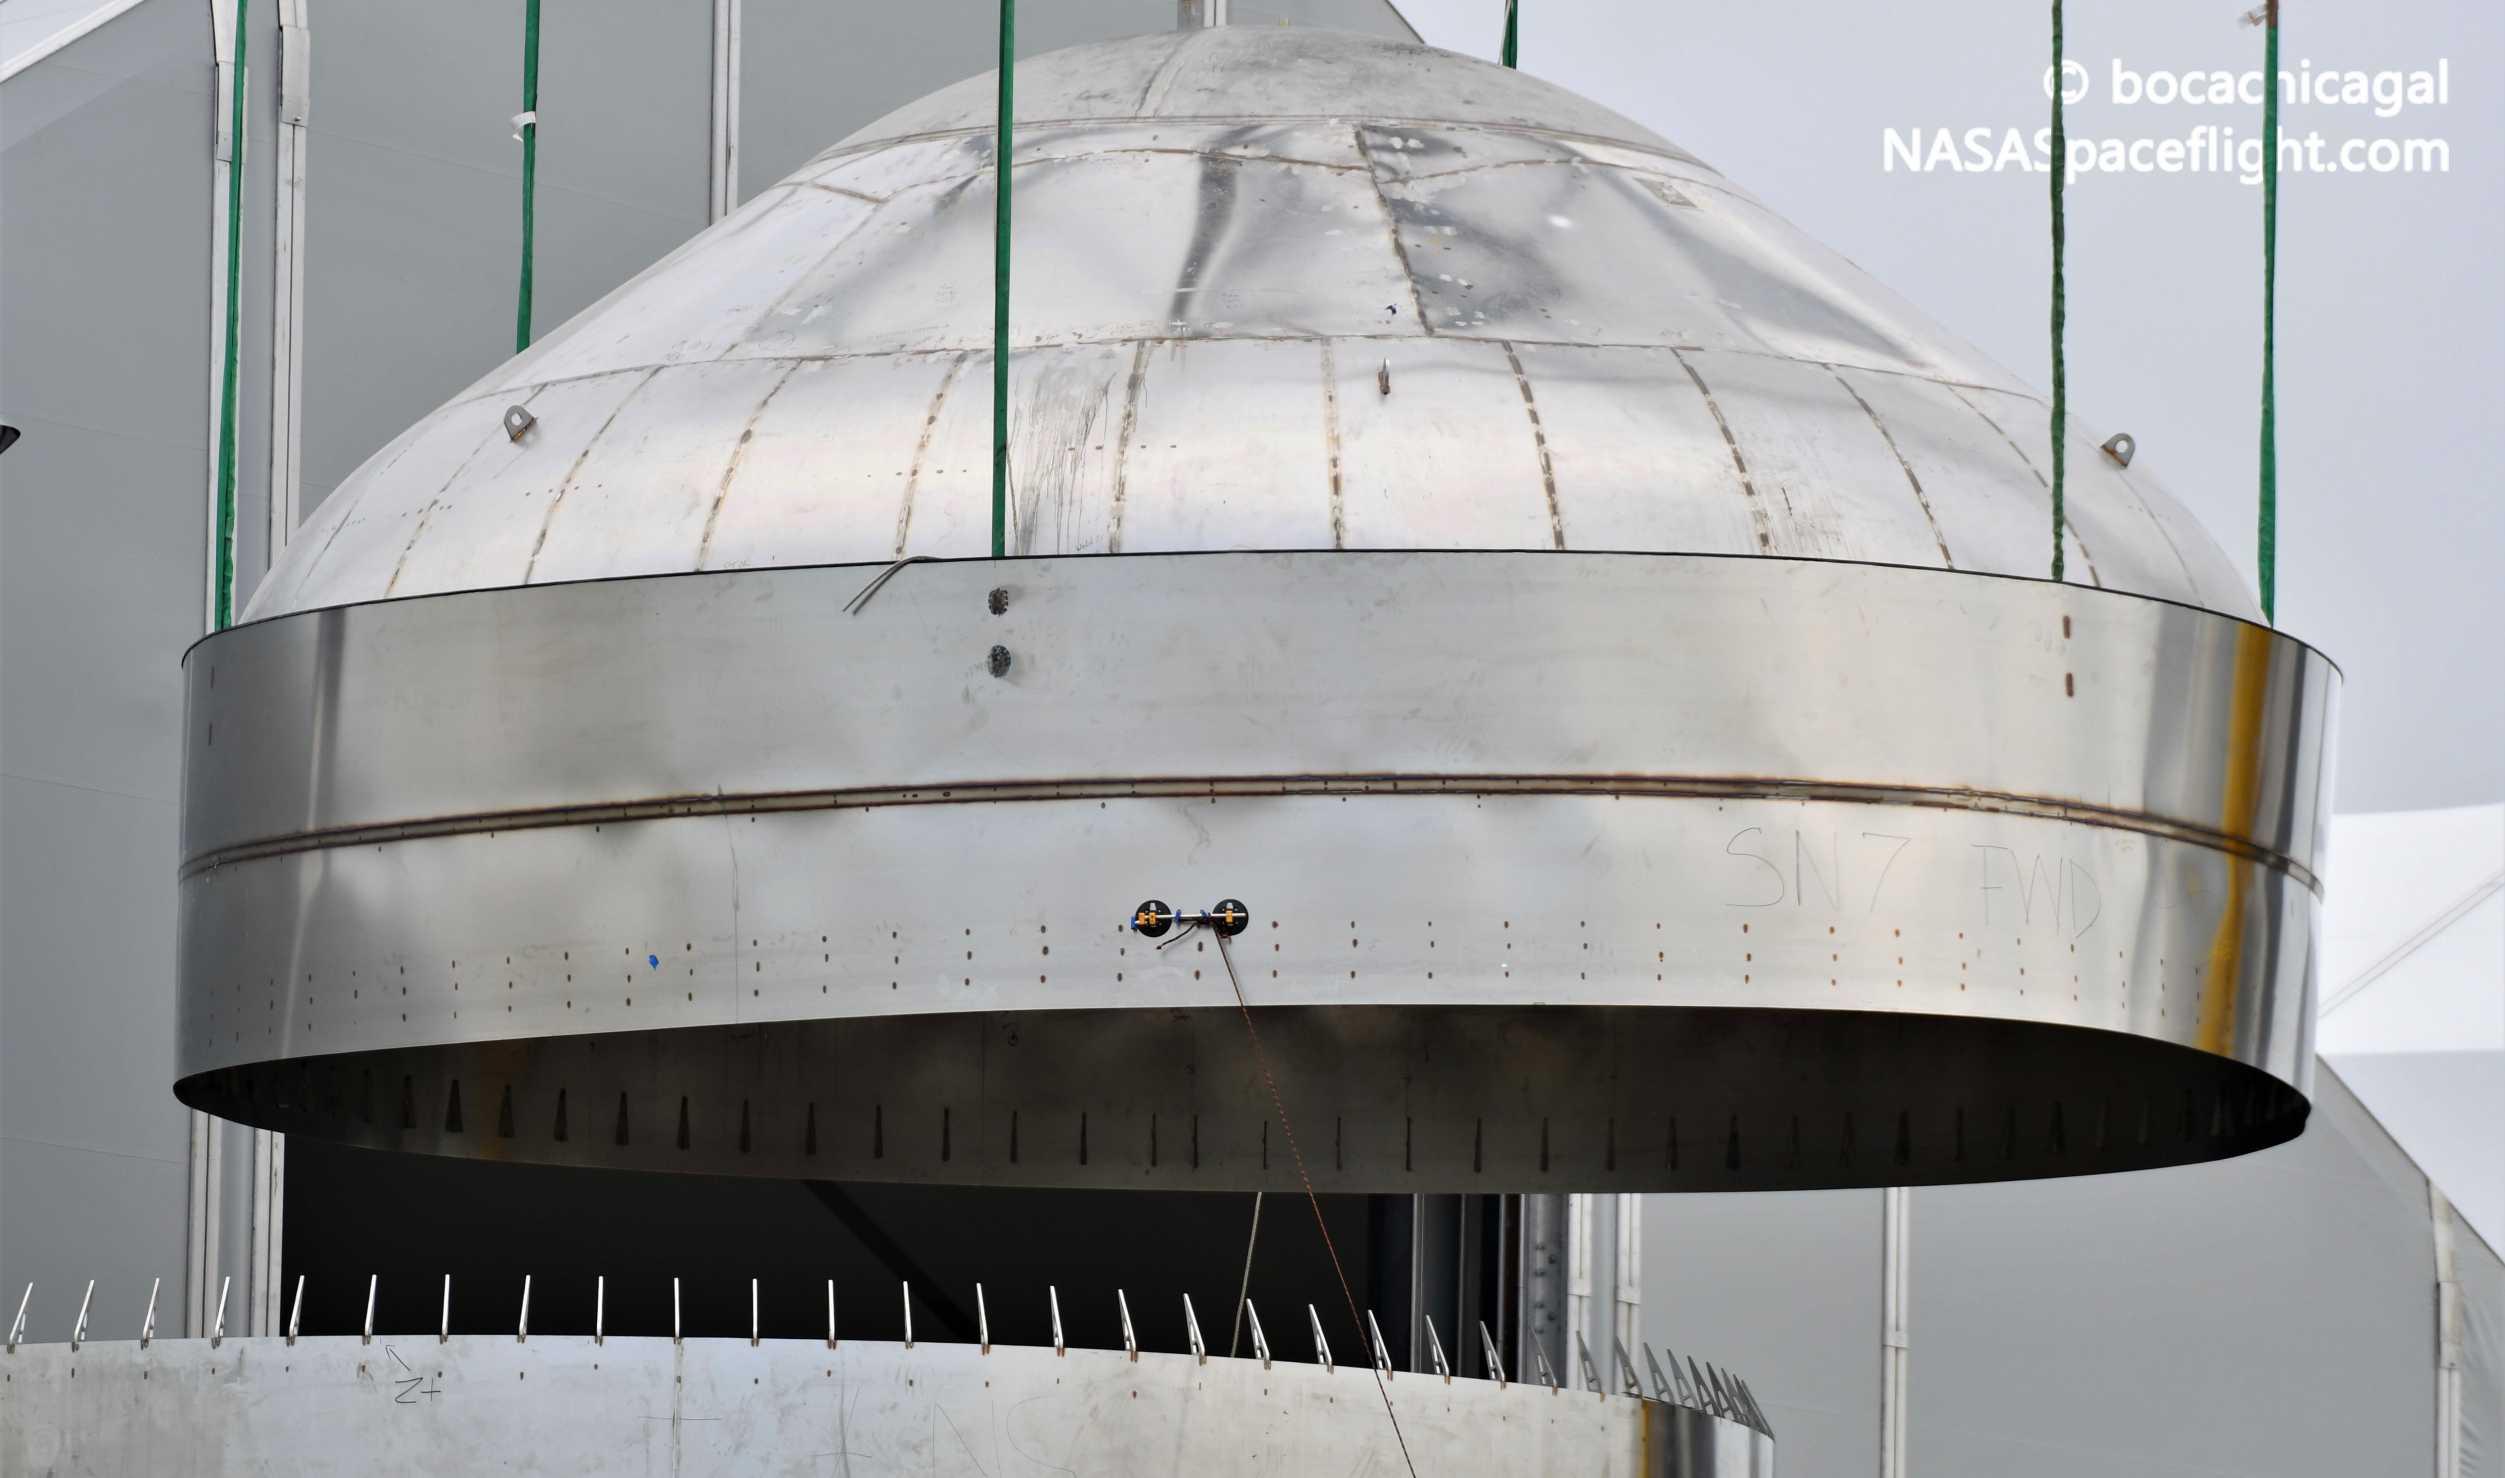 Starship Boca Chica 061020 (NASASpaceflight – bocachicagal) SN7 test tank mate 3 crop (c)